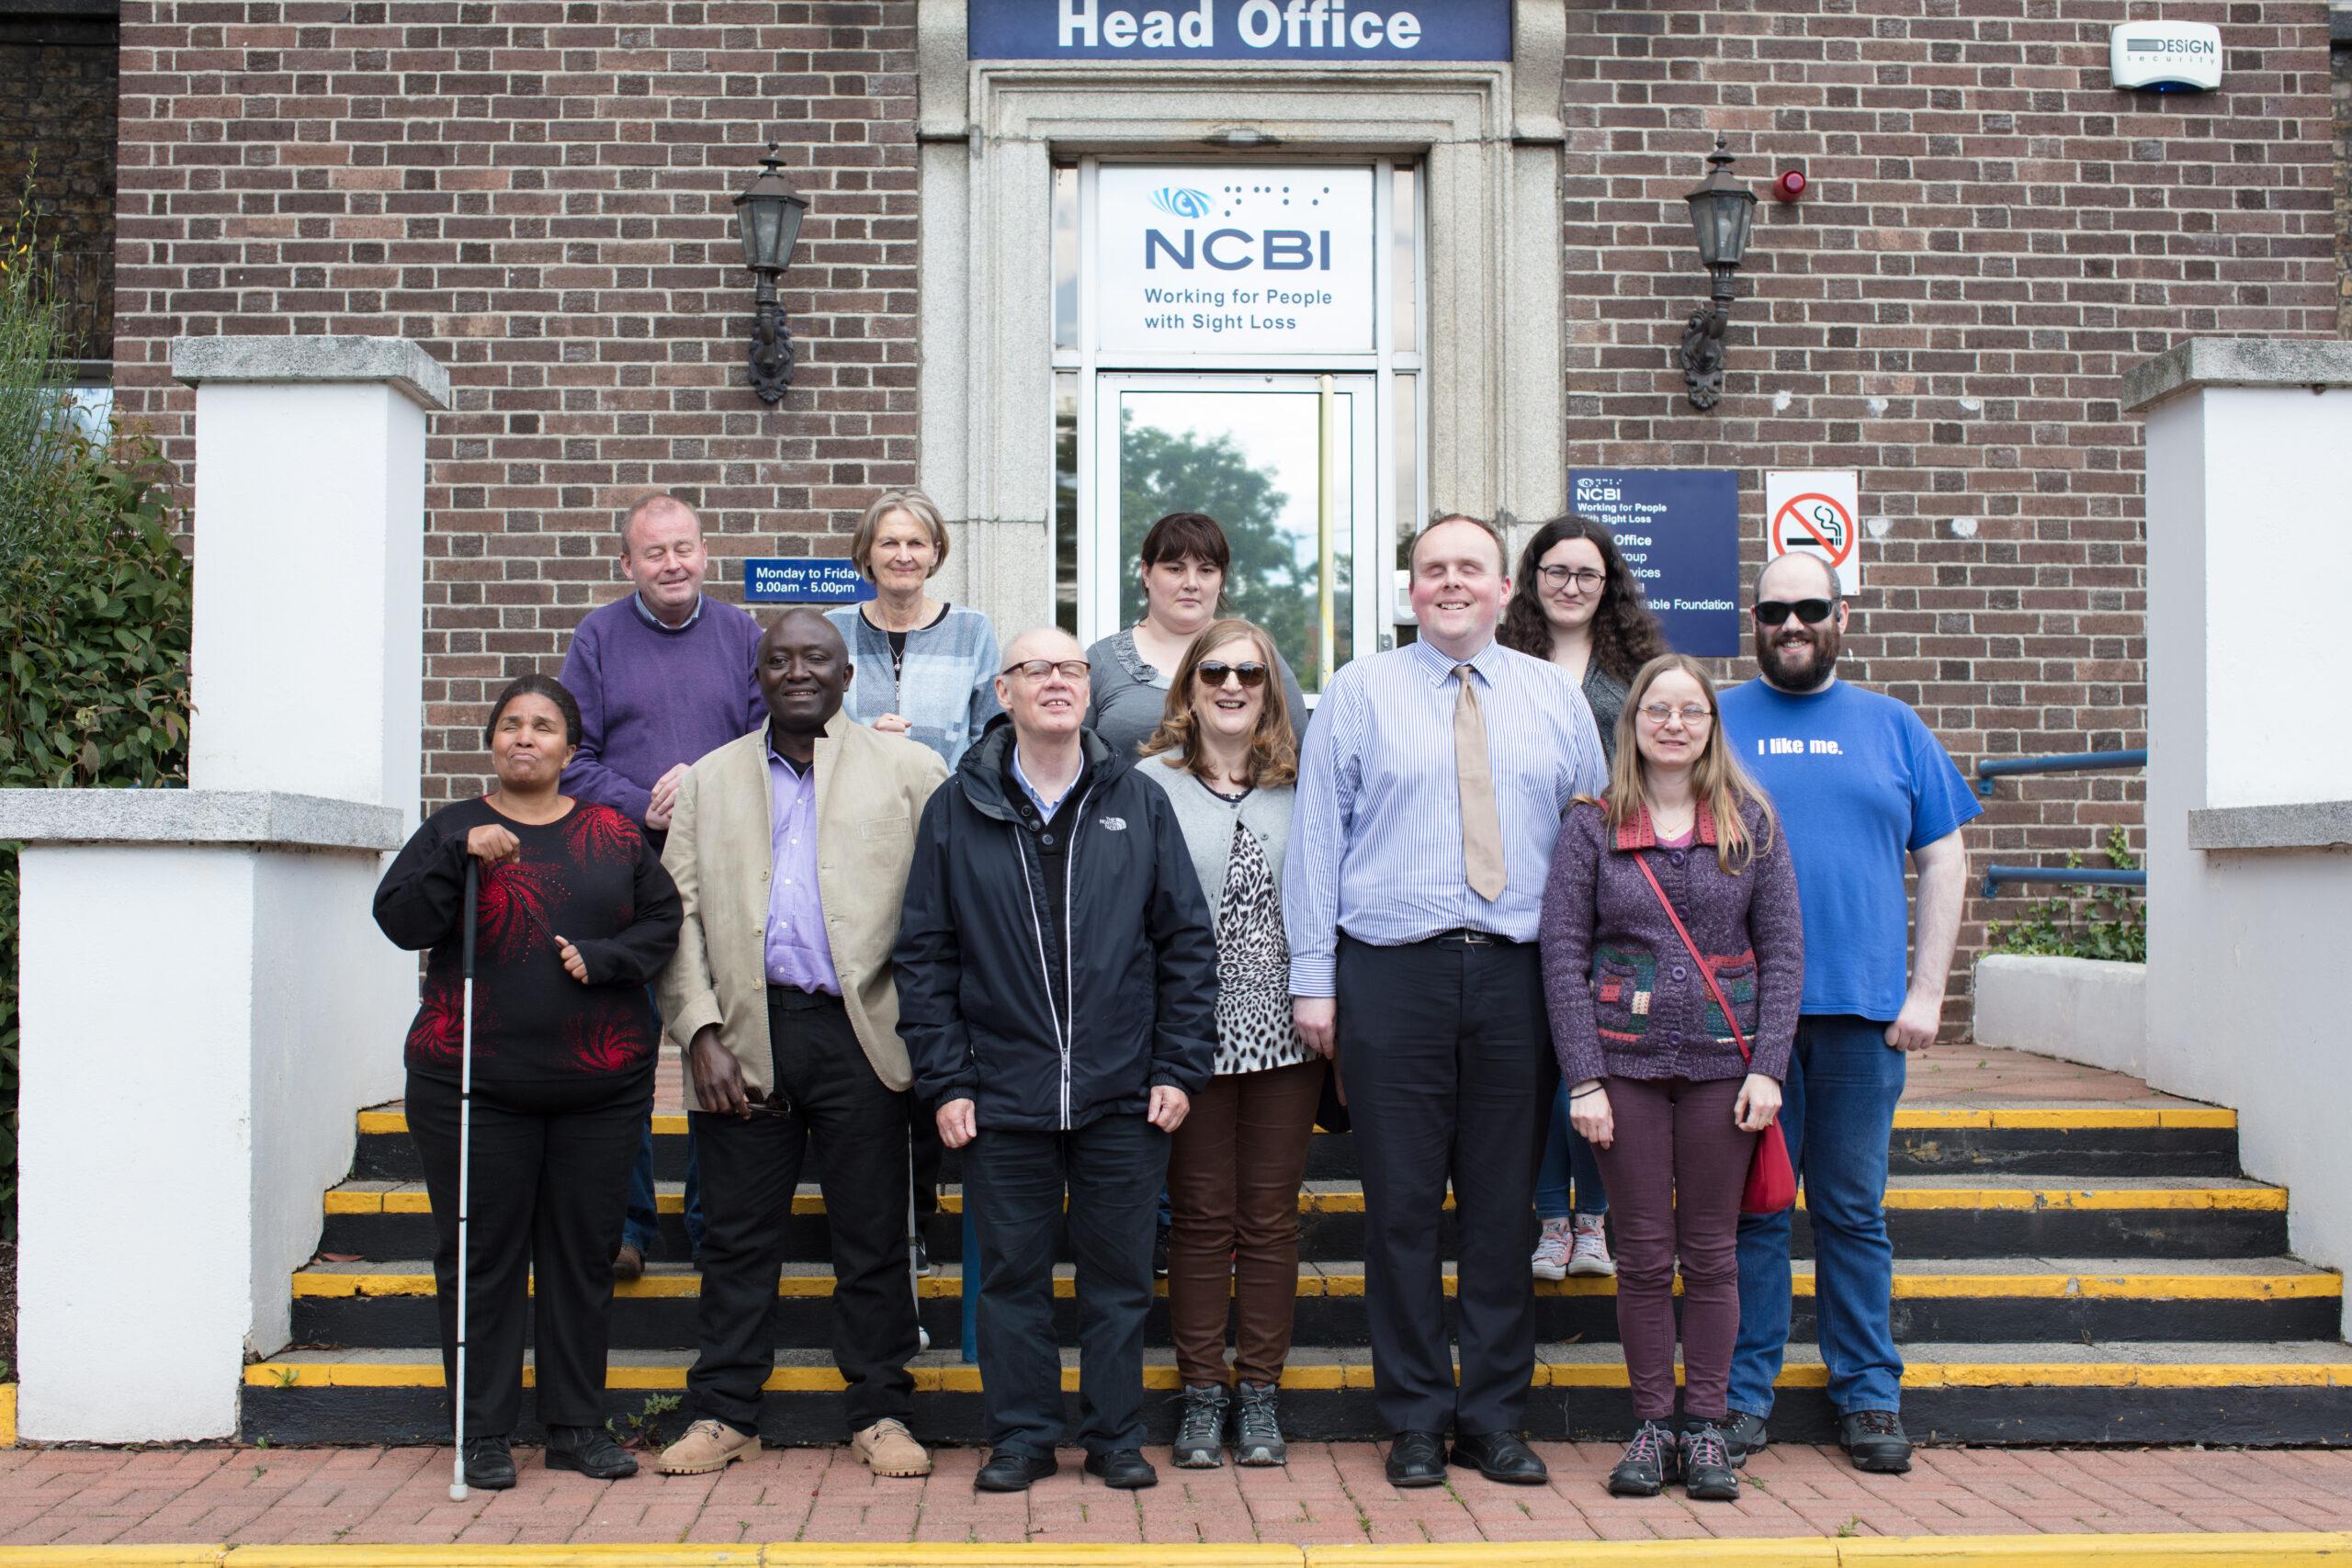 Group of 11 advocates outside NCBI head office